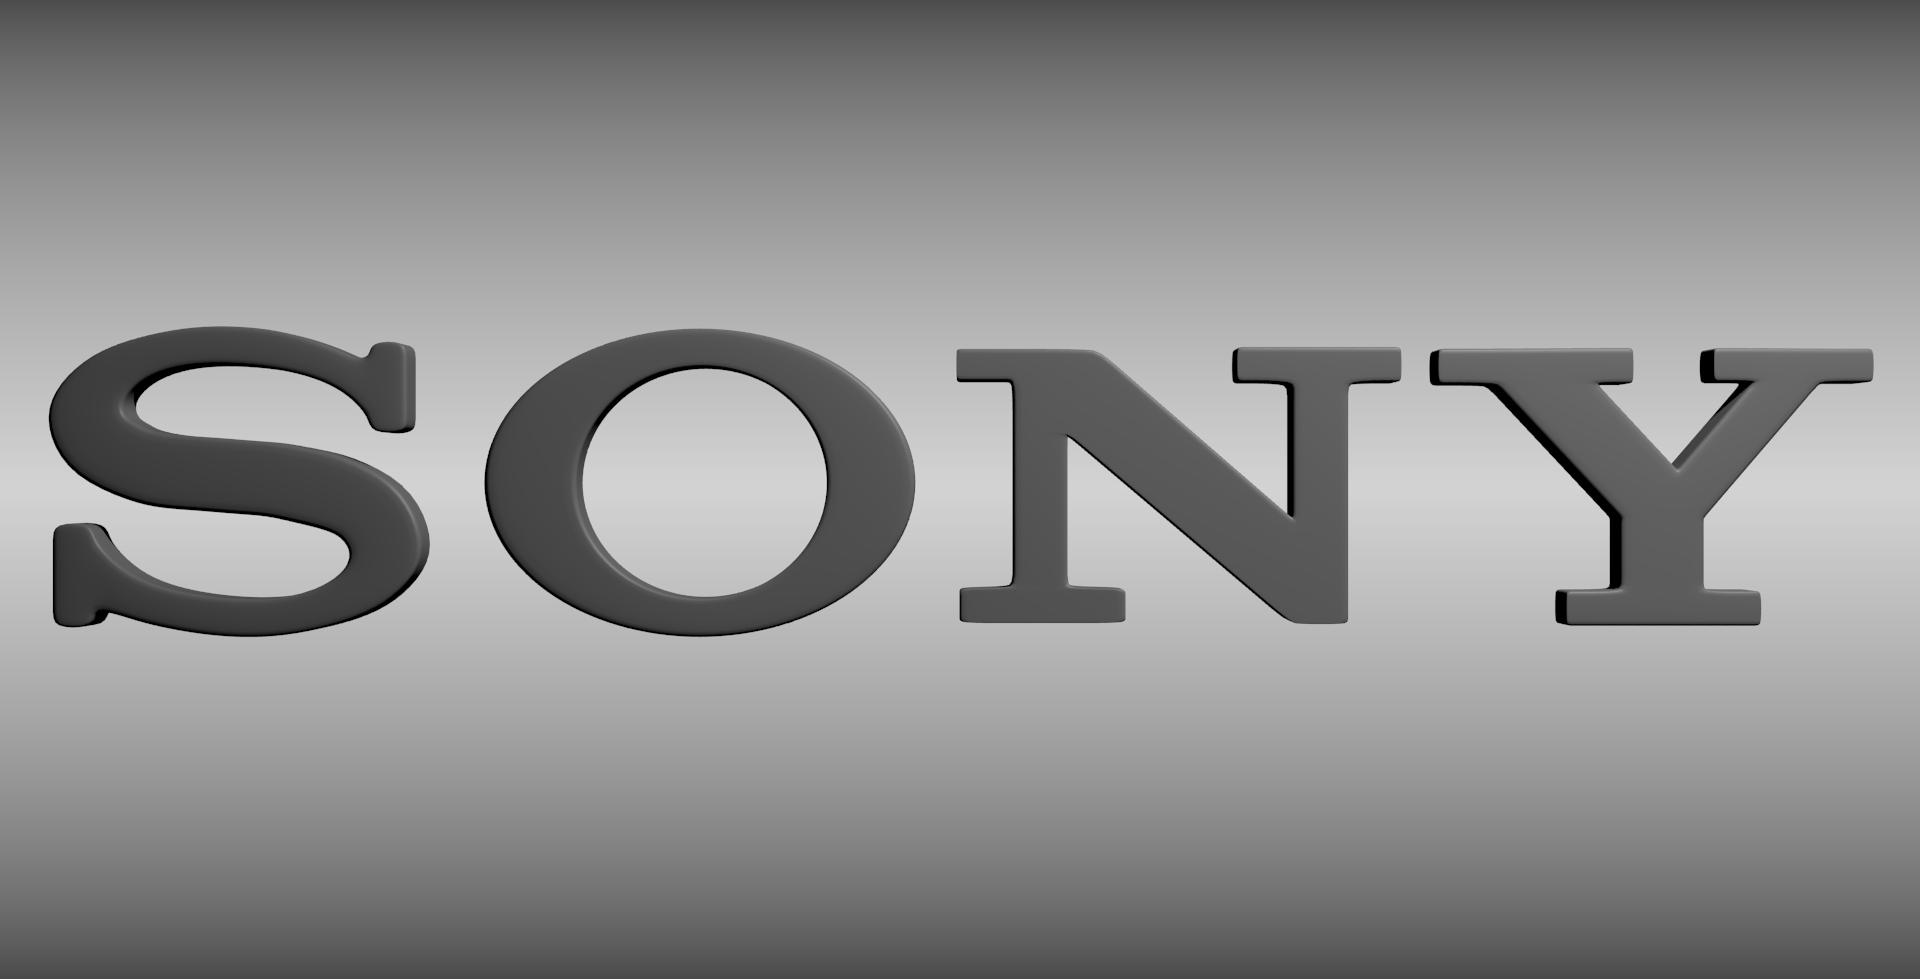 sony_logo_3d_model_3ds_fbx_obj_blend_dae_4f83b4f9-4db5-49b7-9983-23c94bb2071c